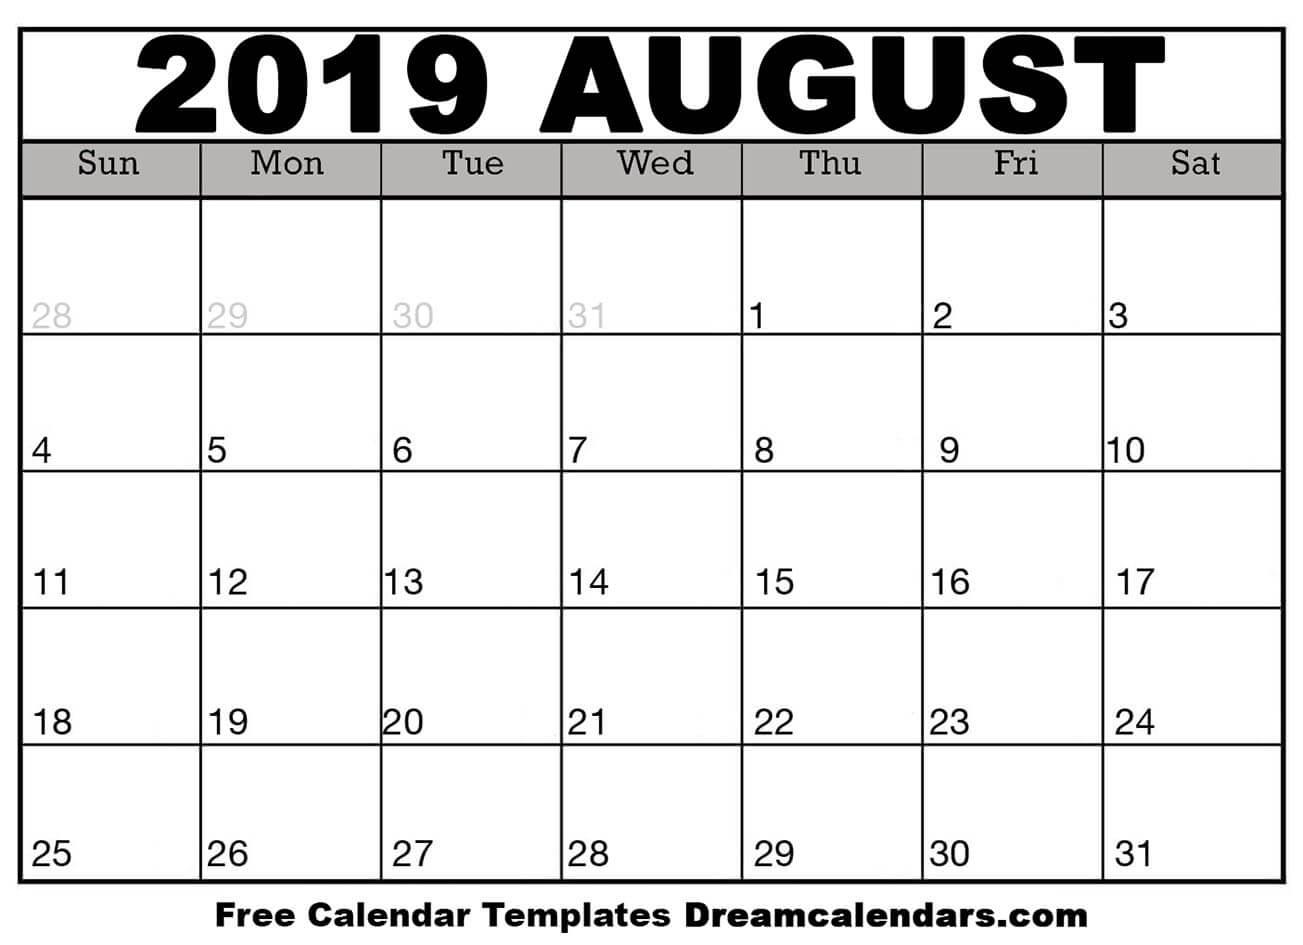 Printable August 2019 Calendar with Calendar Template For August